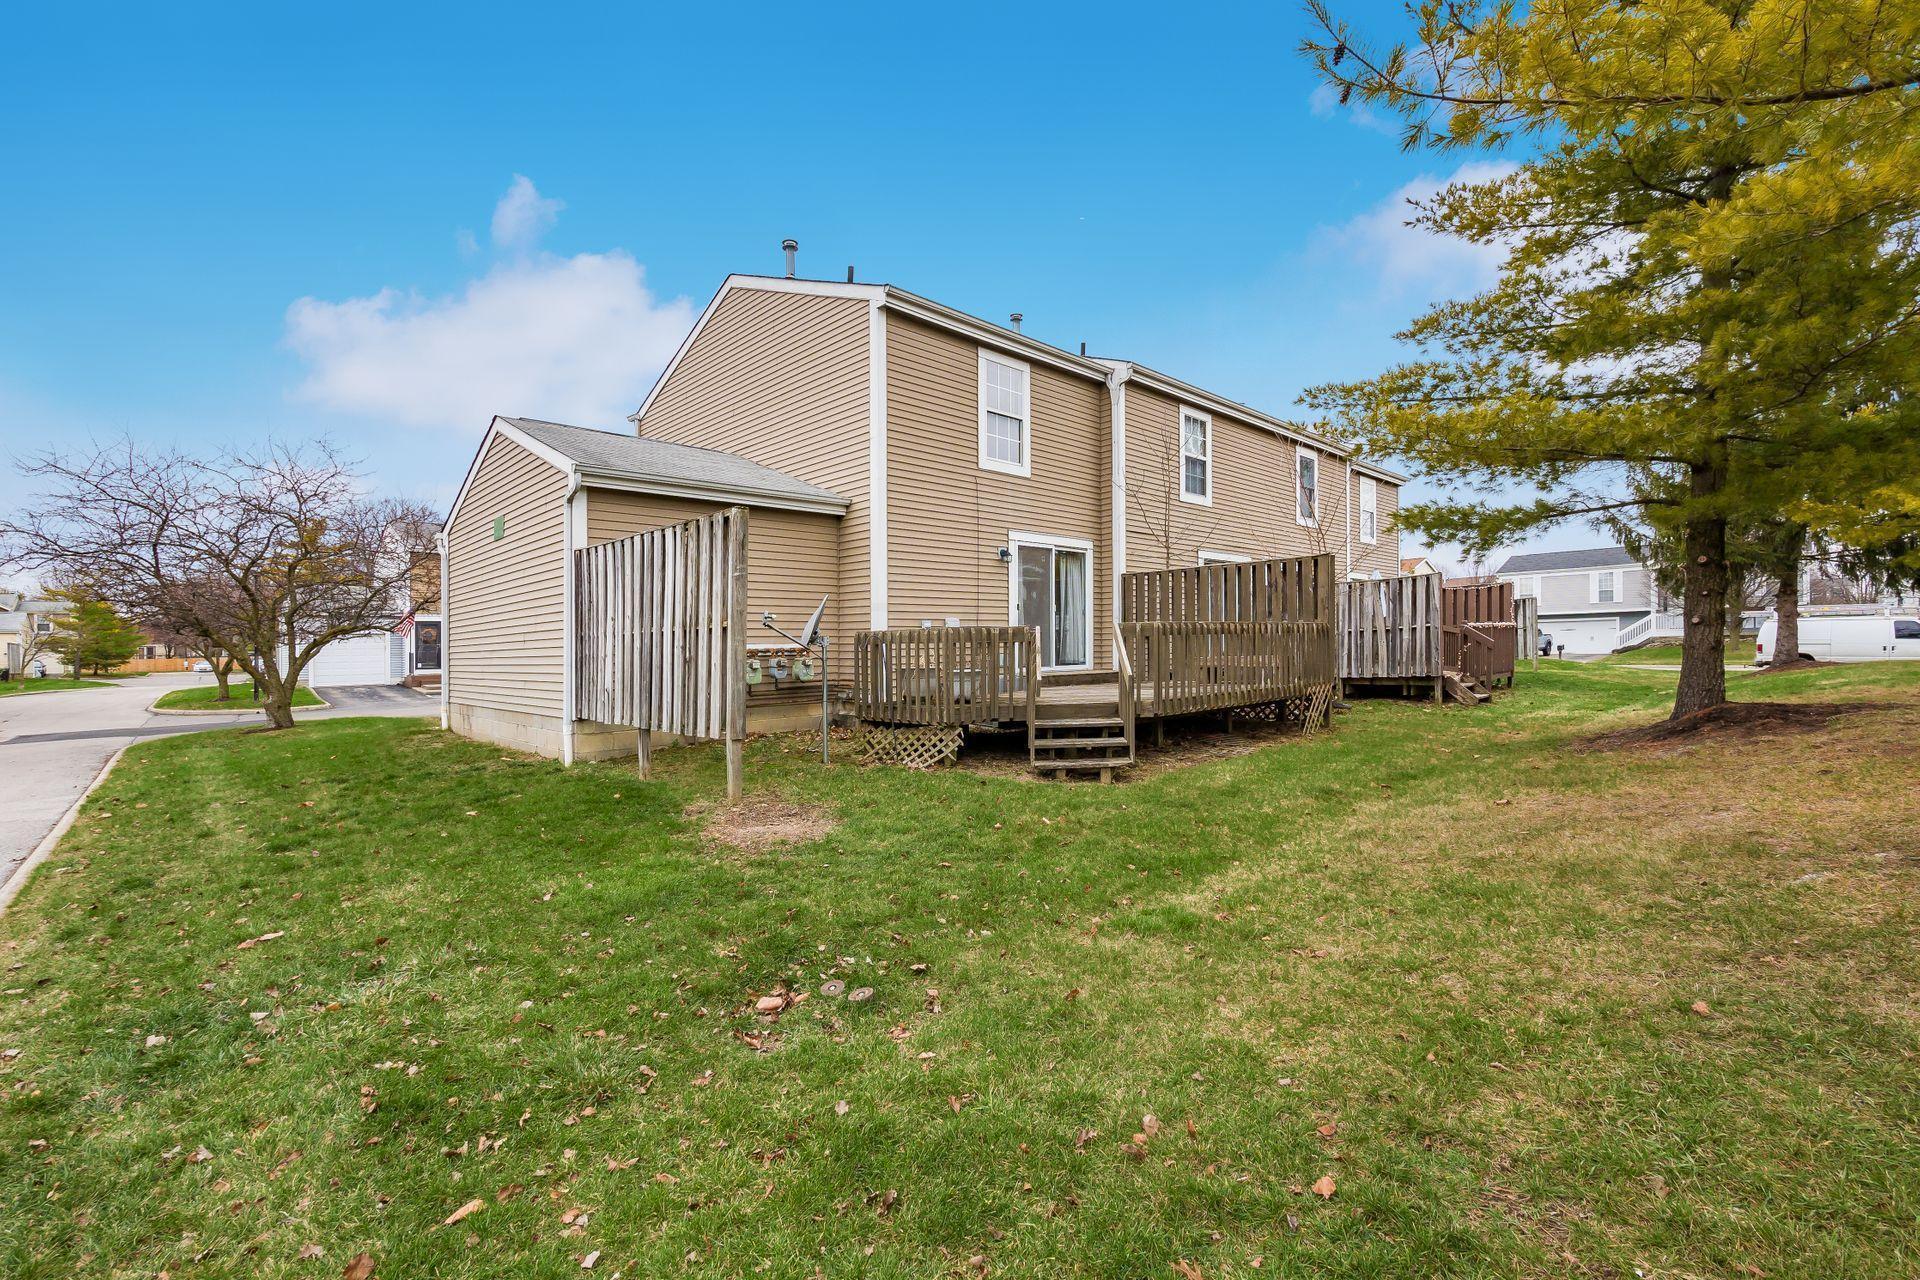 5140 Singleton Drive, Hilliard, Ohio 43026, 2 Bedrooms Bedrooms, ,2 BathroomsBathrooms,Residential,For Sale,Singleton,221000767